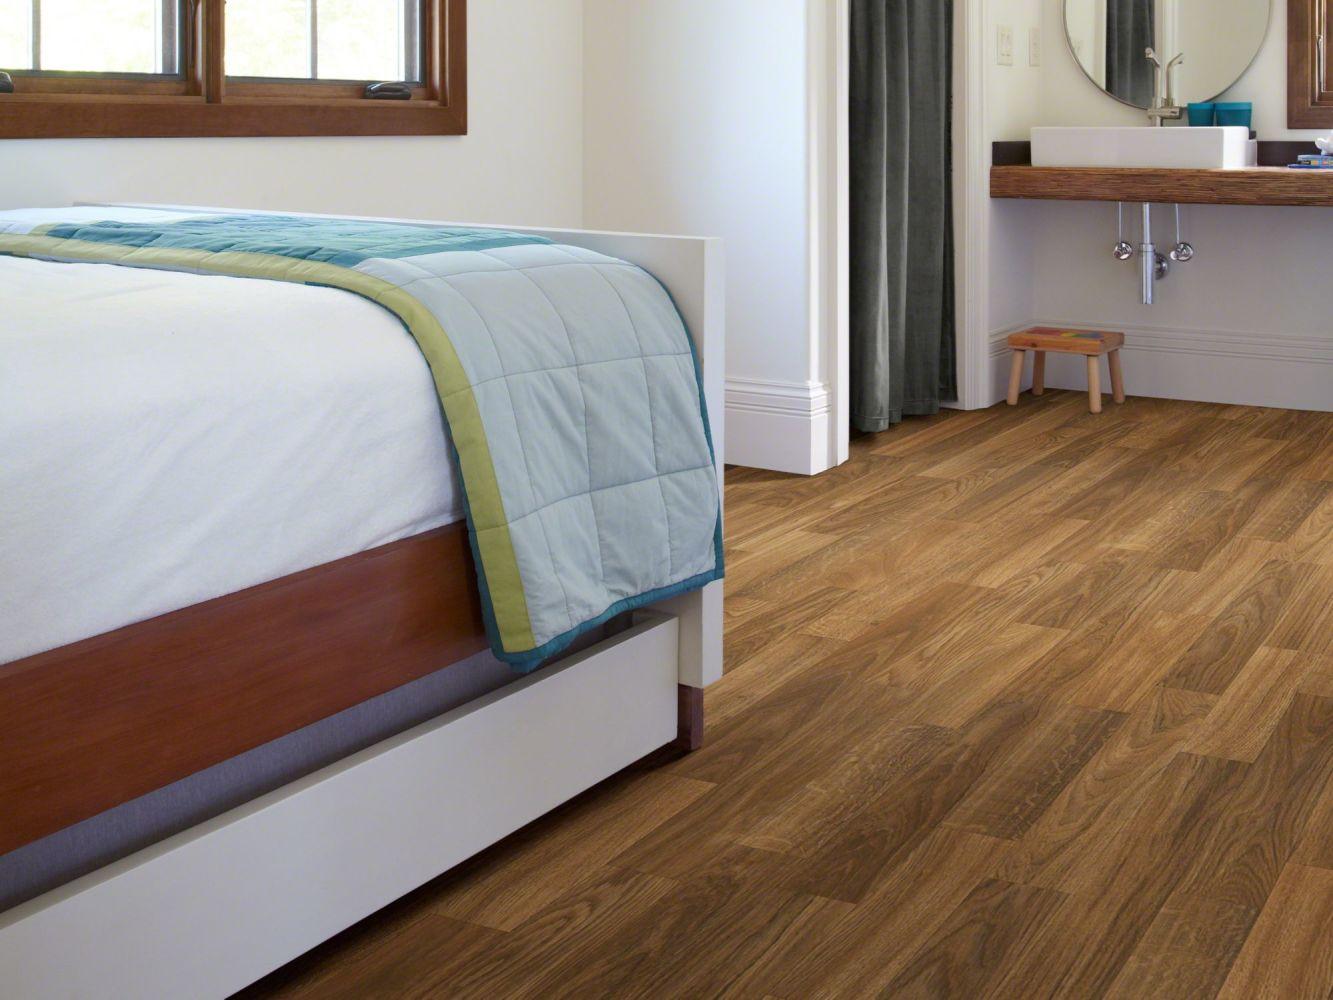 Shaw Floors Resilient Residential Adirondack 12c Shasta 00609_SA623